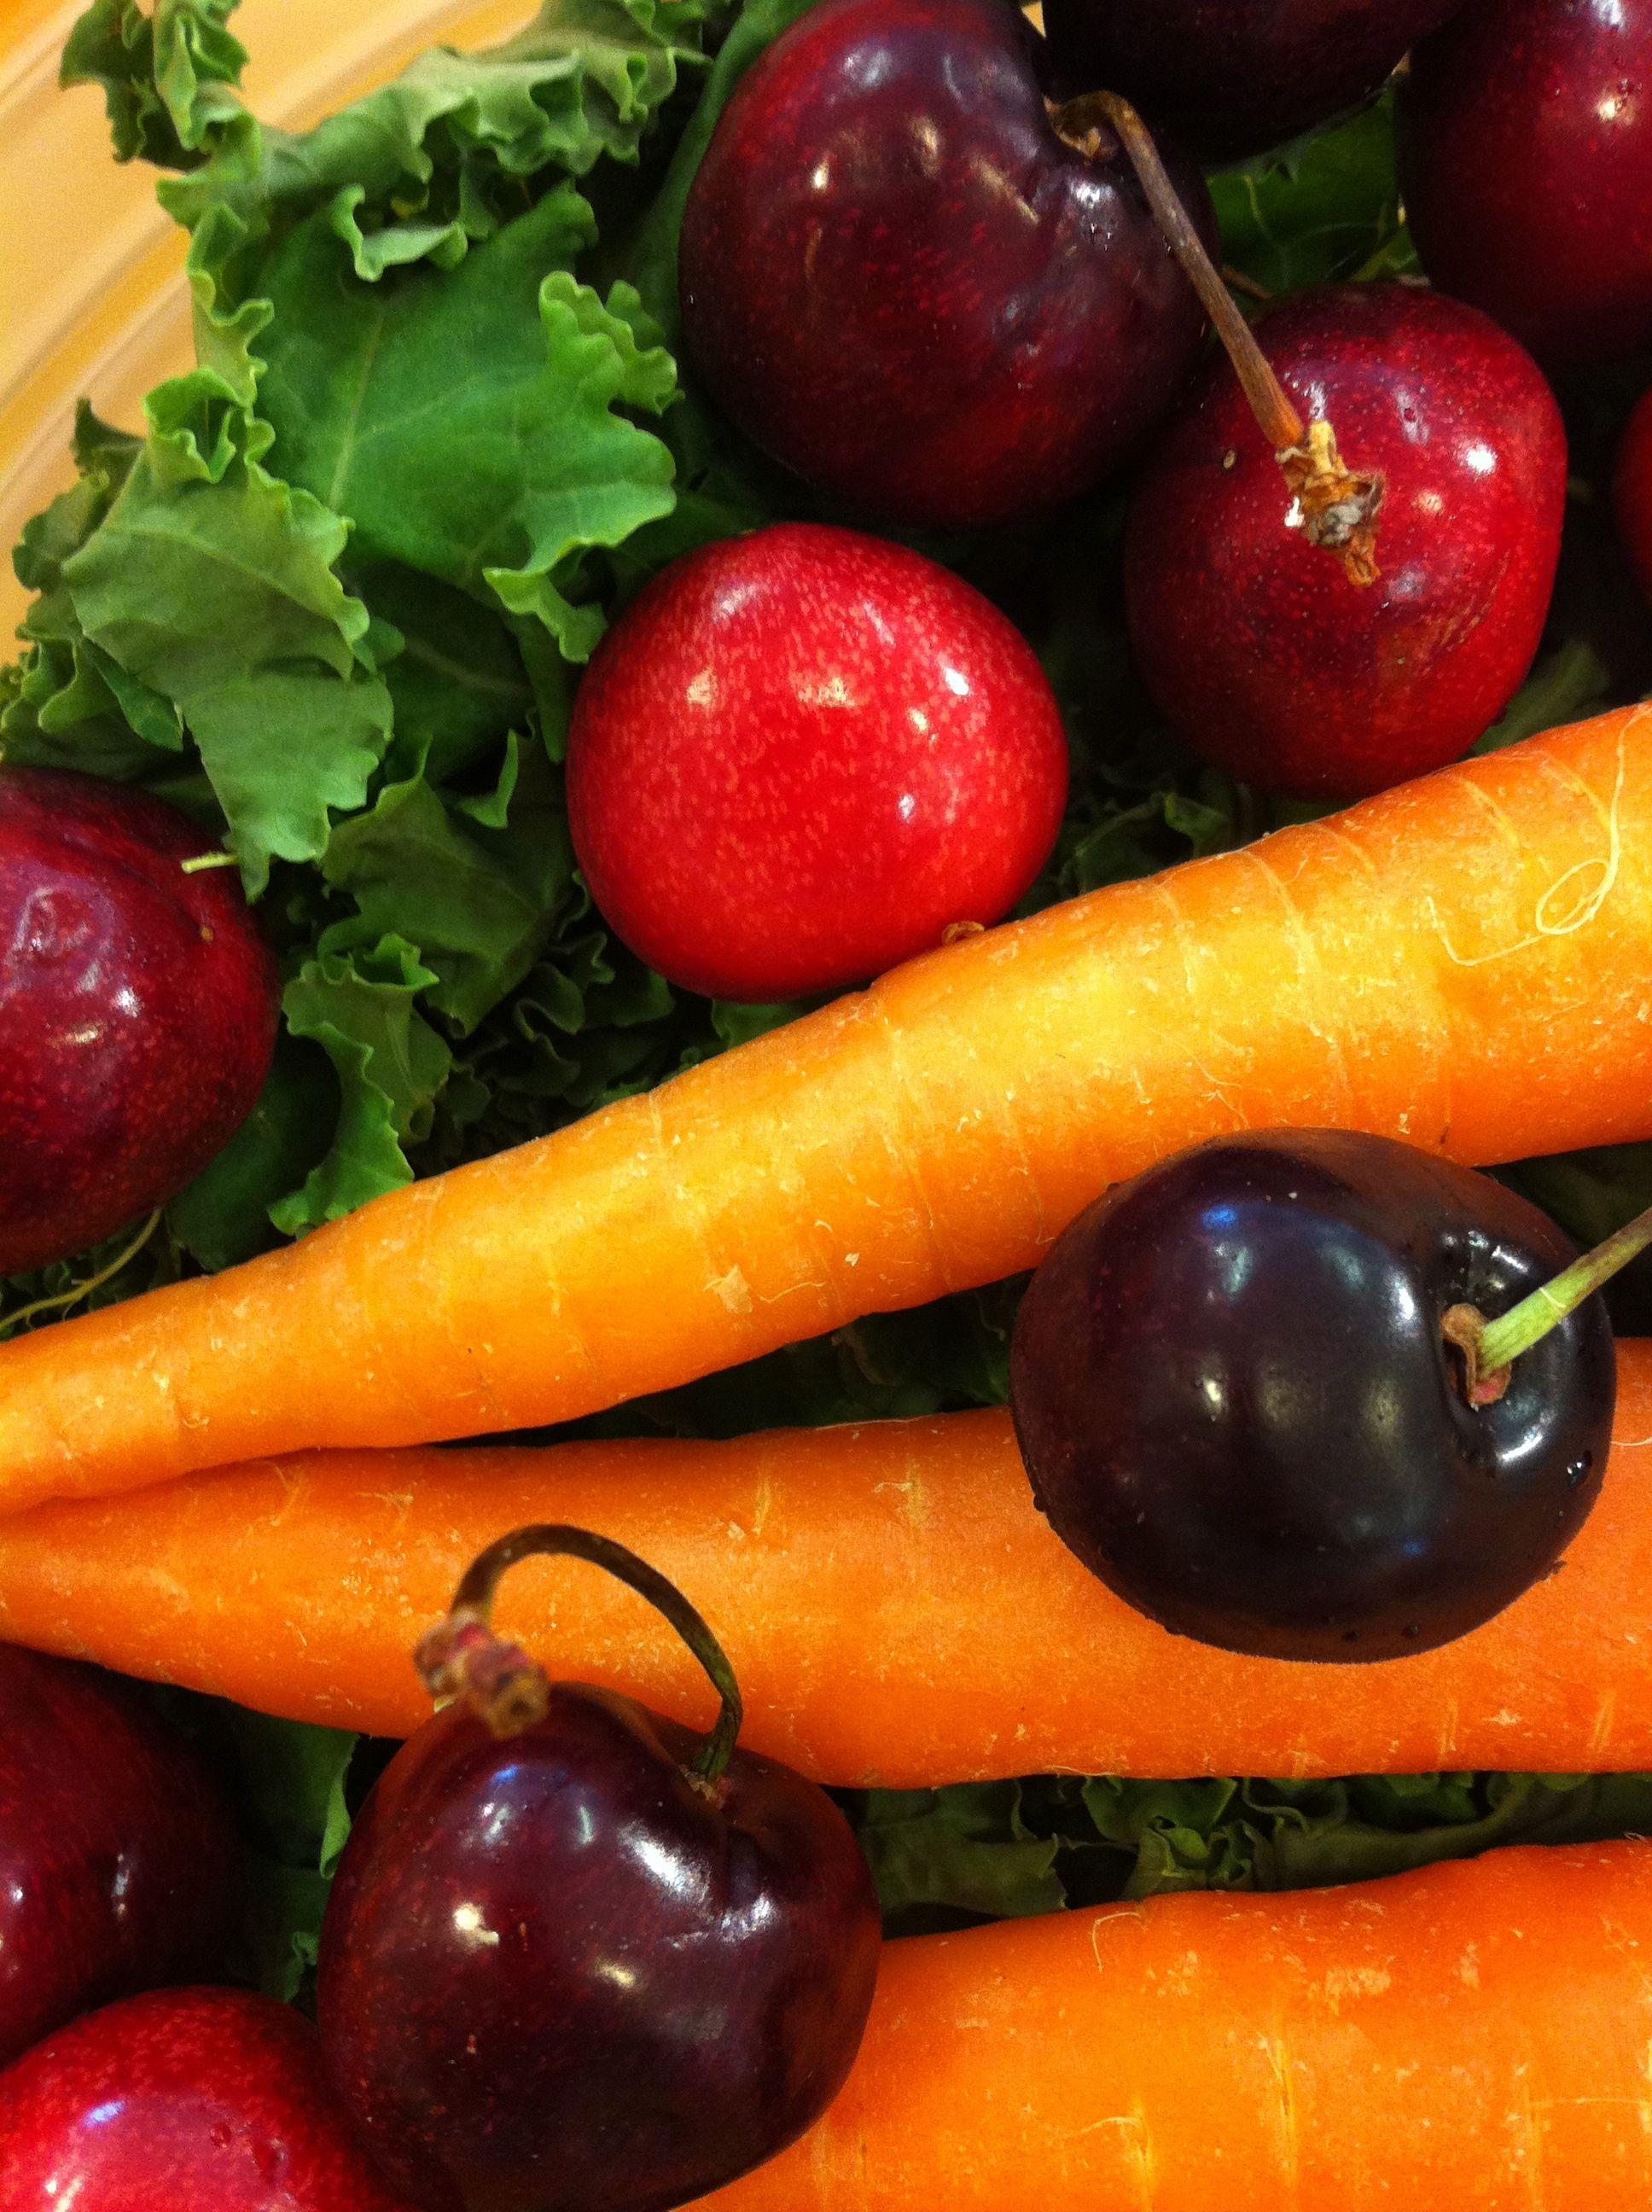 картинки подсолнуха вишни моркови молочницы пимафуцином можно